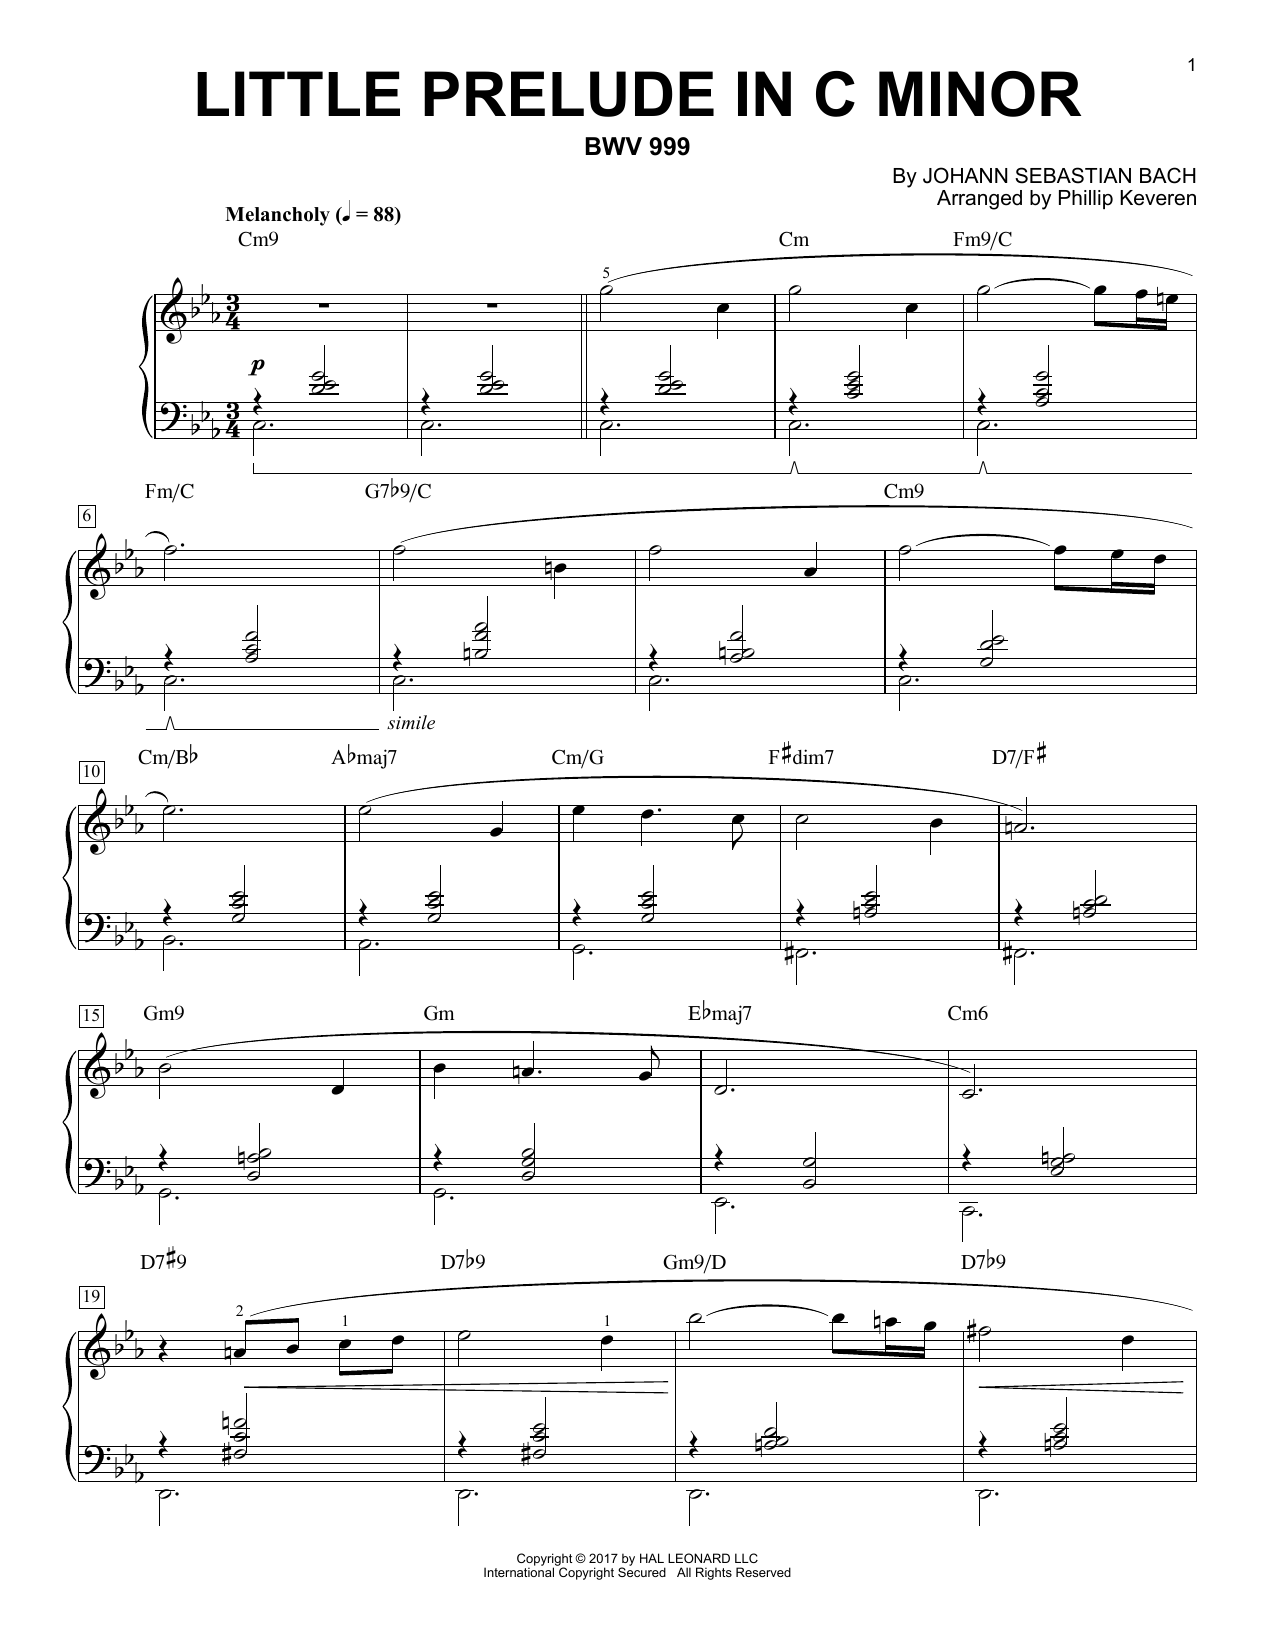 Johann Sebastian Bach Little Prelude in C Minor, BWV 999 [Jazz version] (arr. Phillip Keveren) sheet music notes and chords. Download Printable PDF.